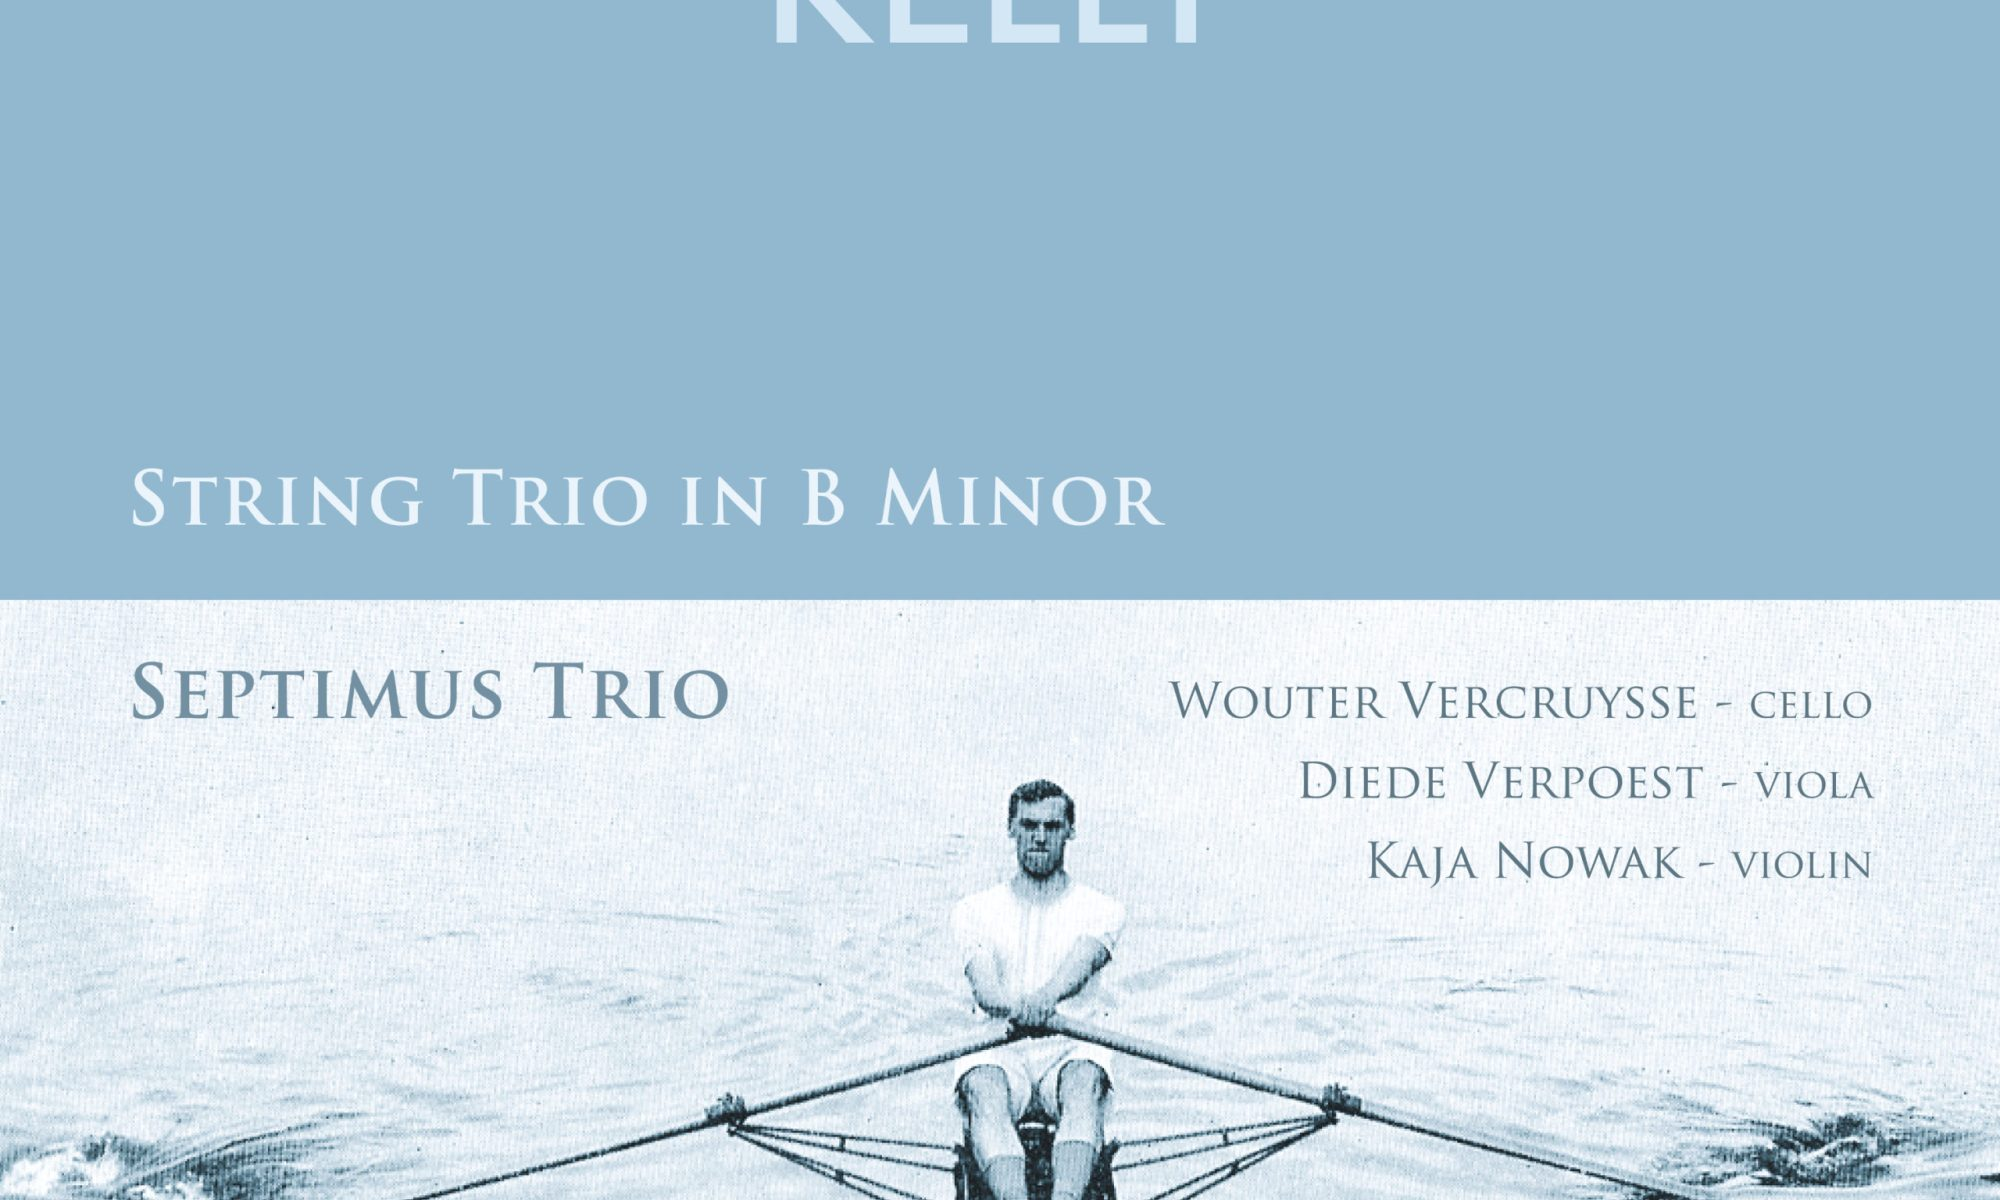 world premiere recording of Frederick Septimus Kelly's String Trio